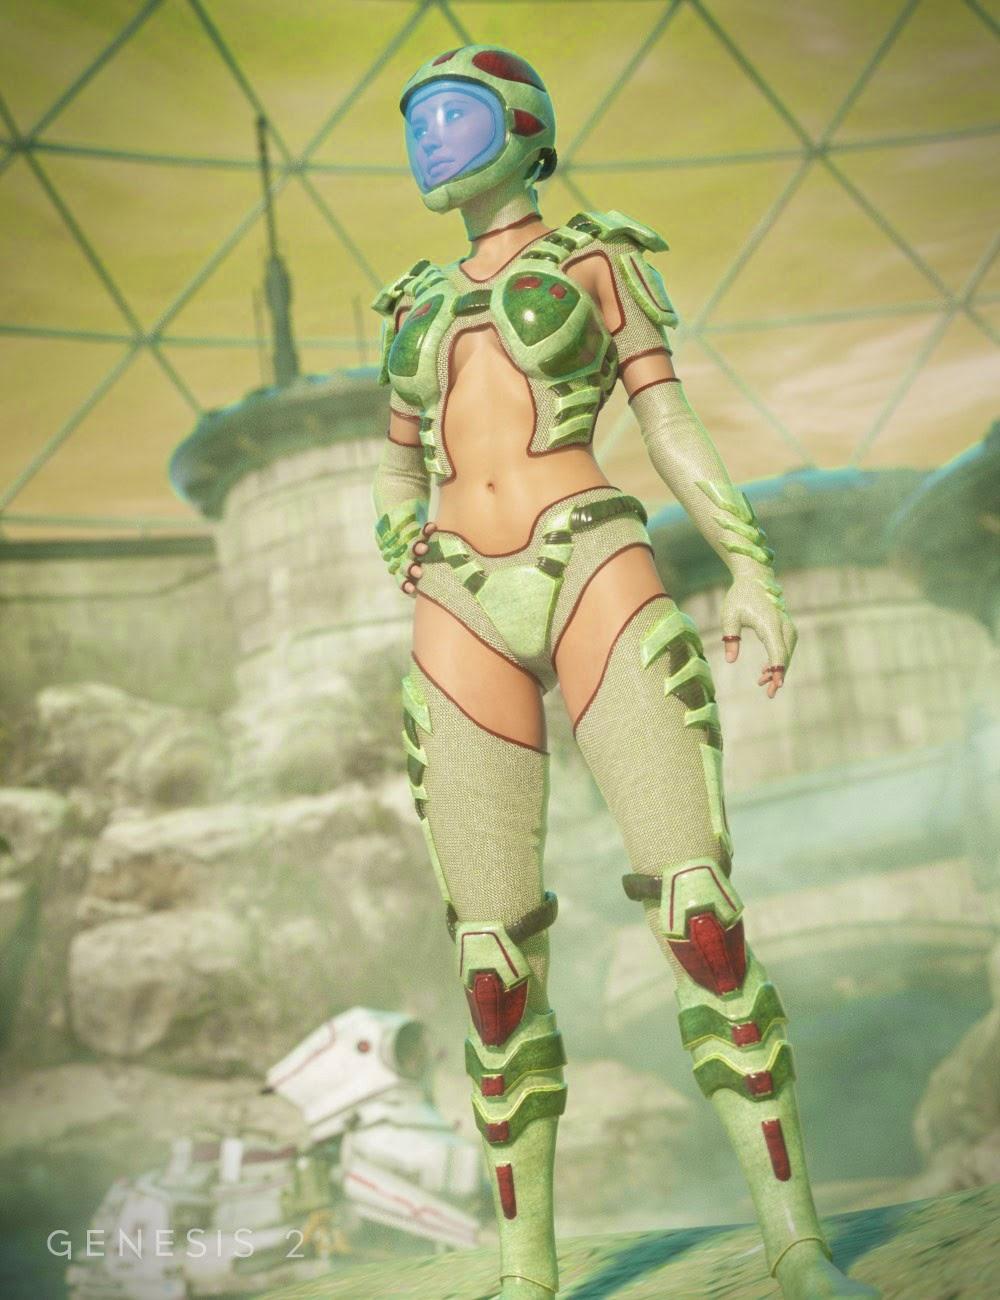 Scifi Sniper Textures Suit